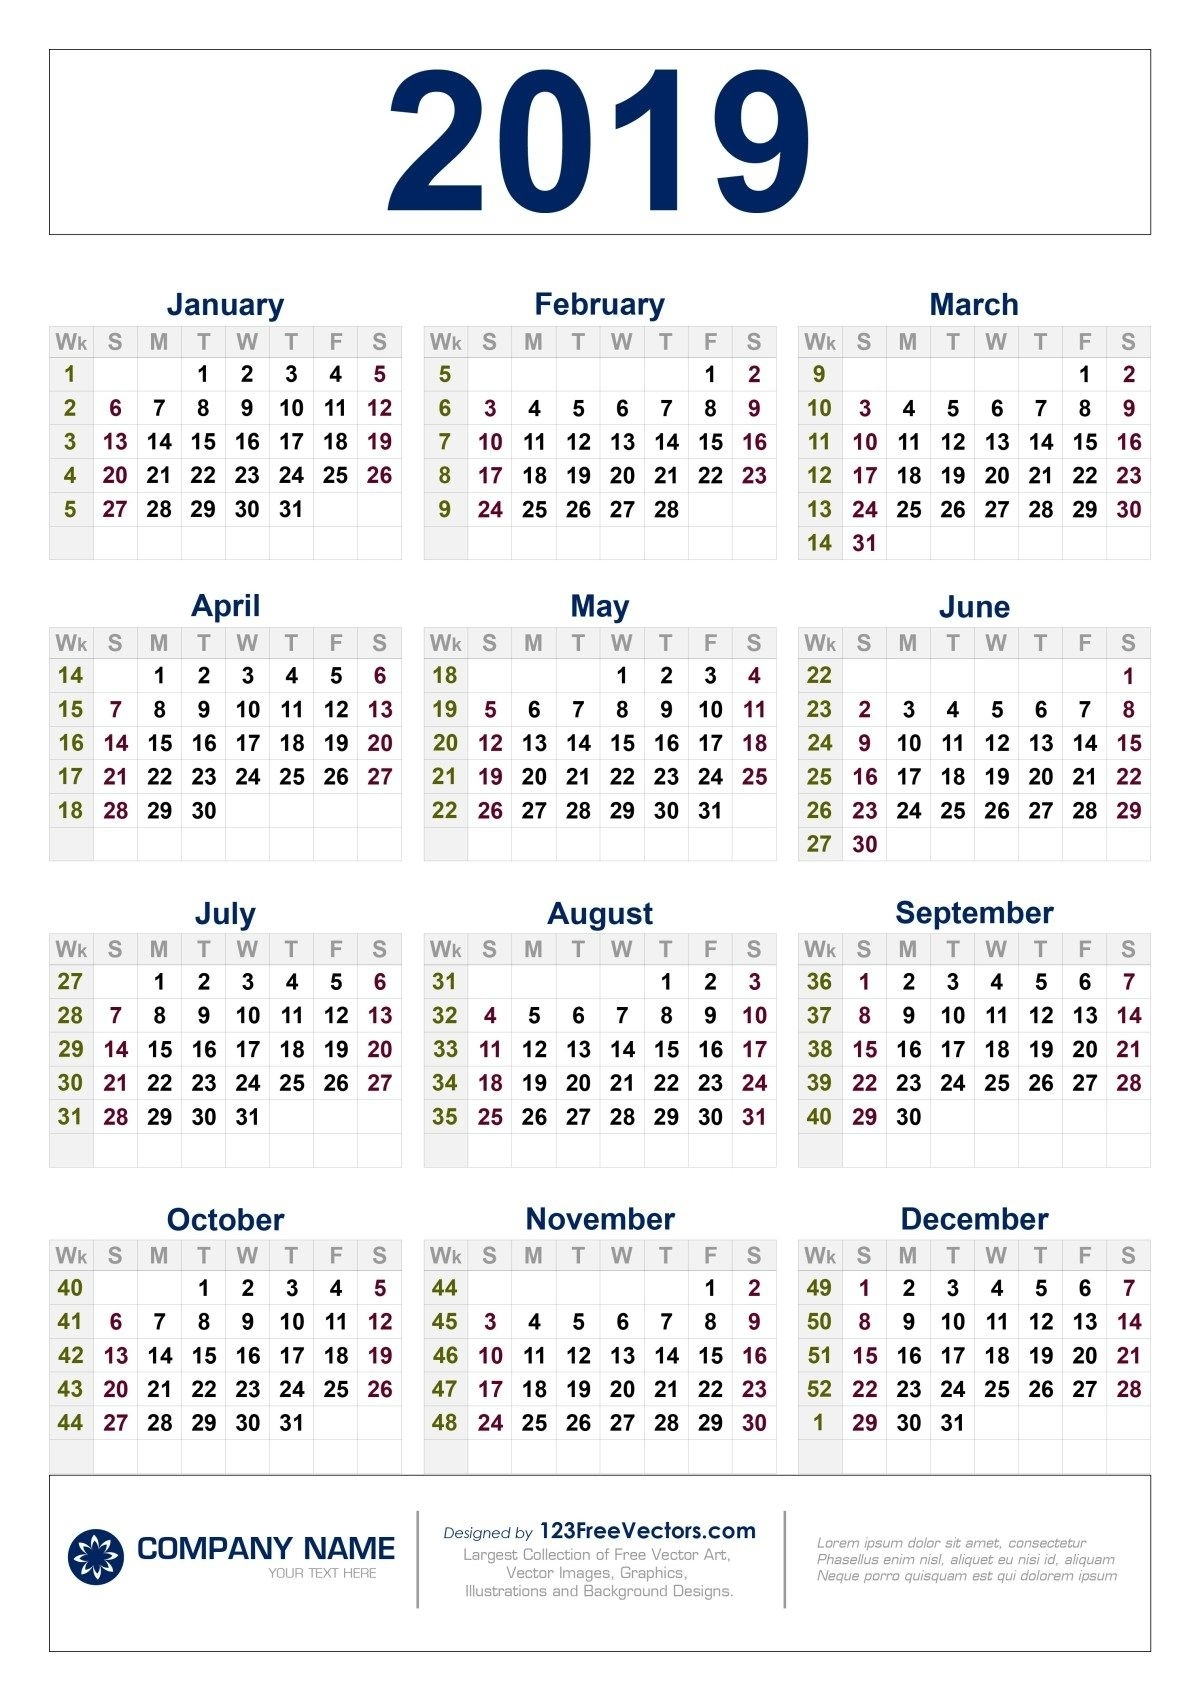 Free Download 2019 Calendar With Week Numbers   Calendar with 2020 Calendar Weeks Numbered Excel